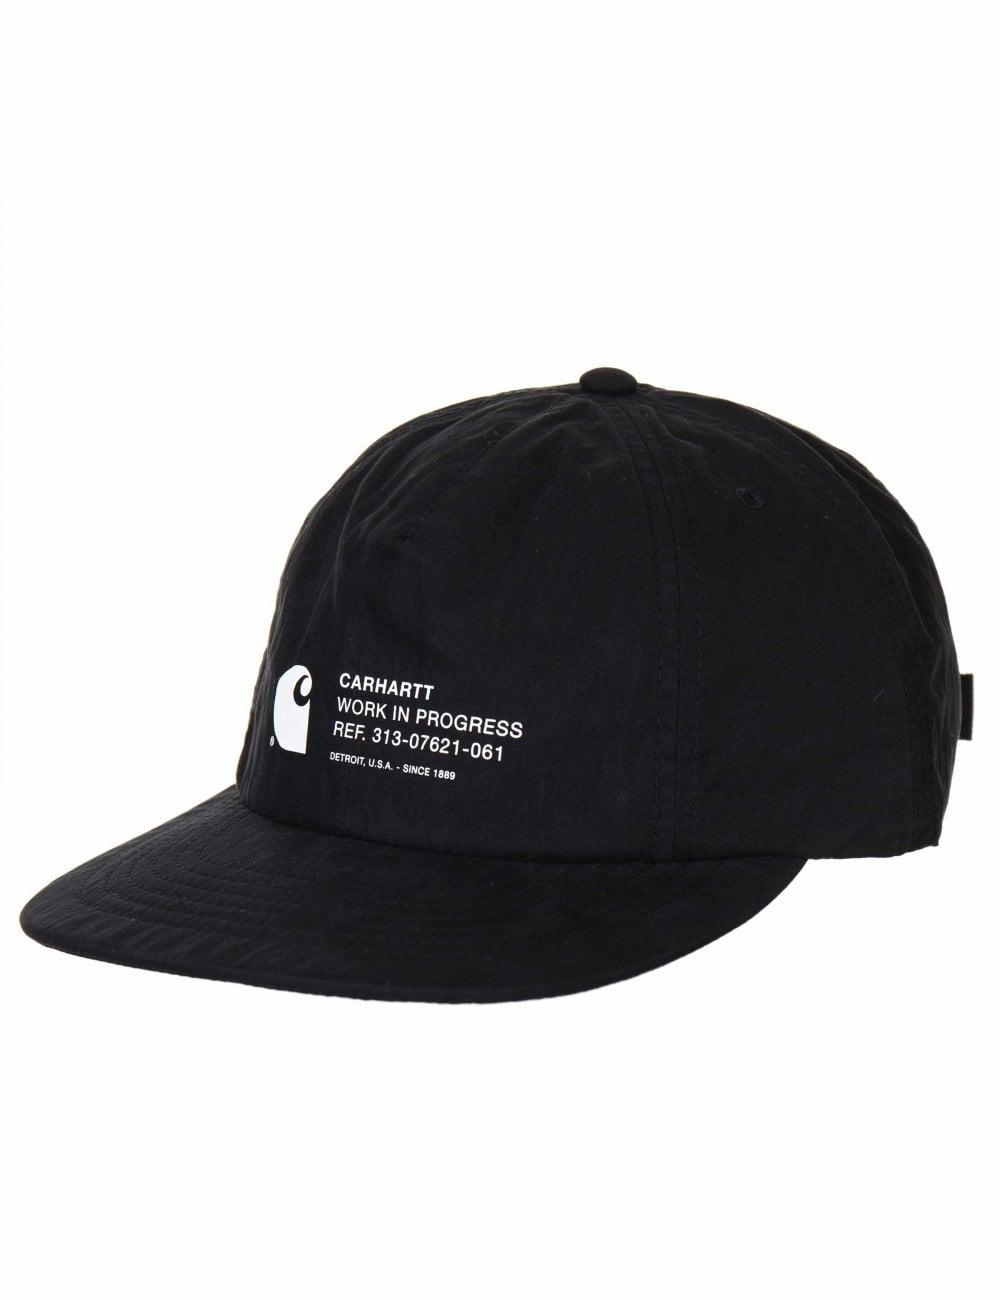 2a7120413 Coleman Cap - Black/White